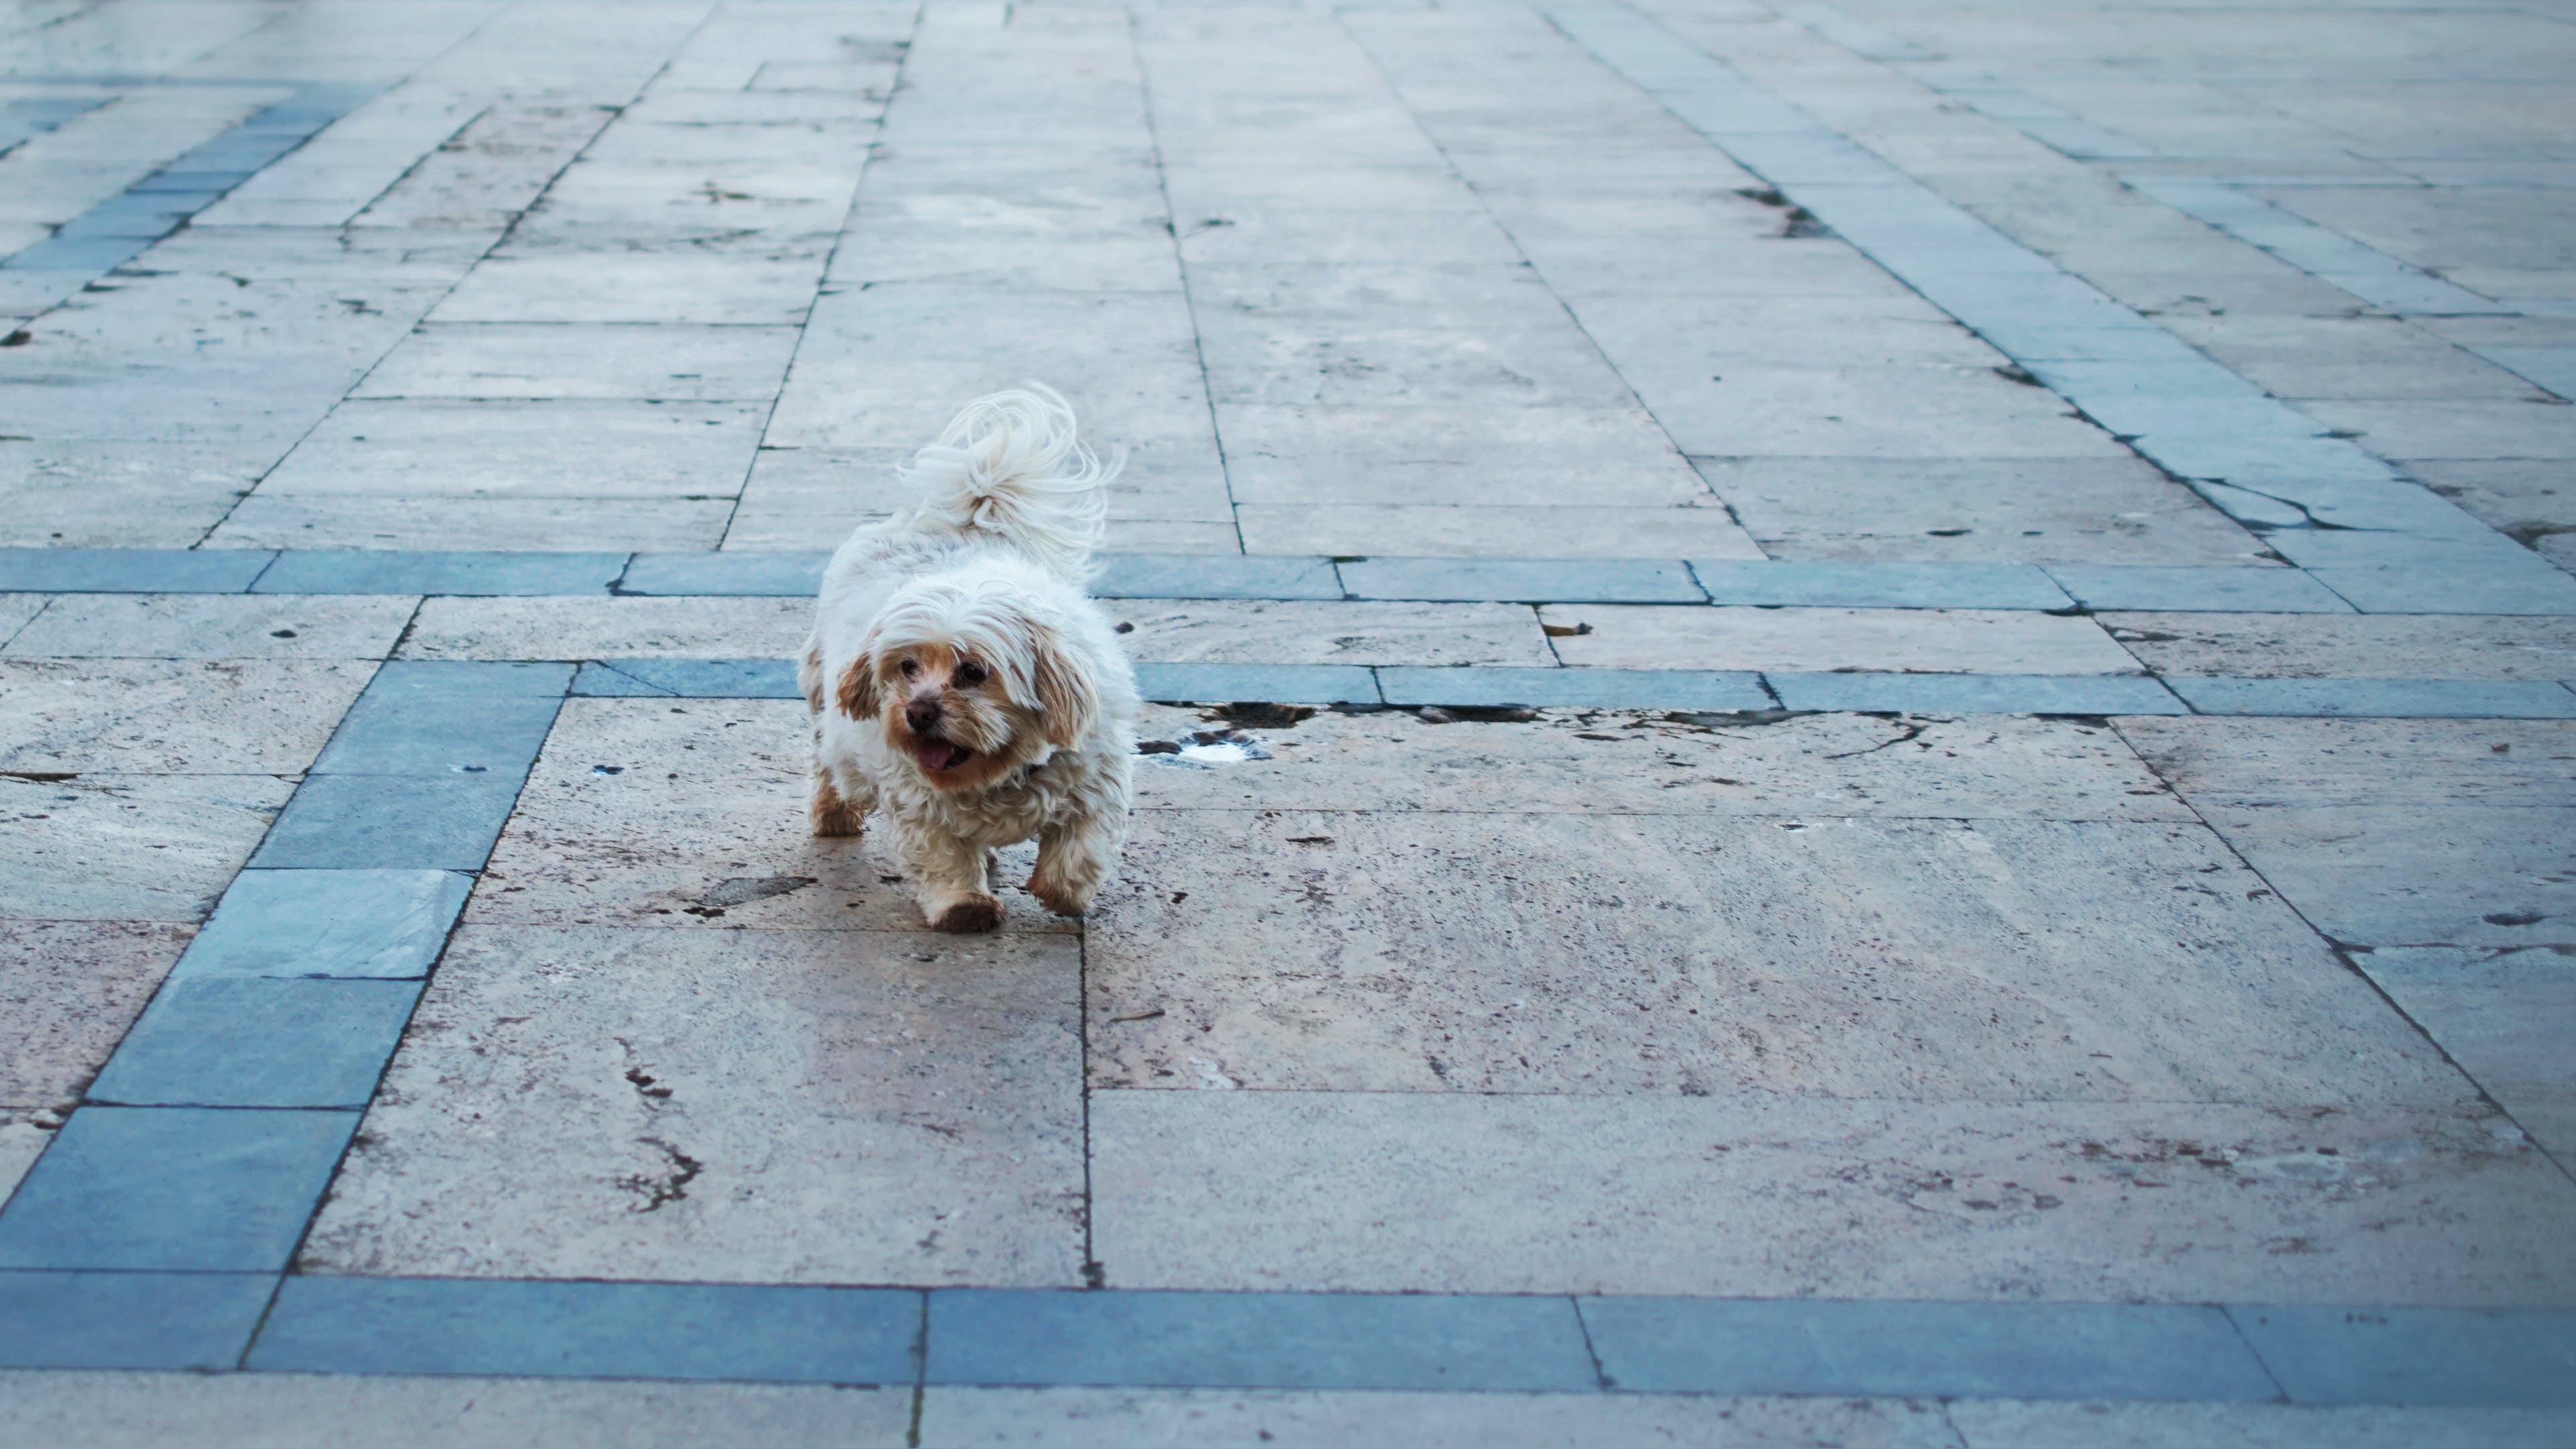 Free stock photo of pavement, white dog